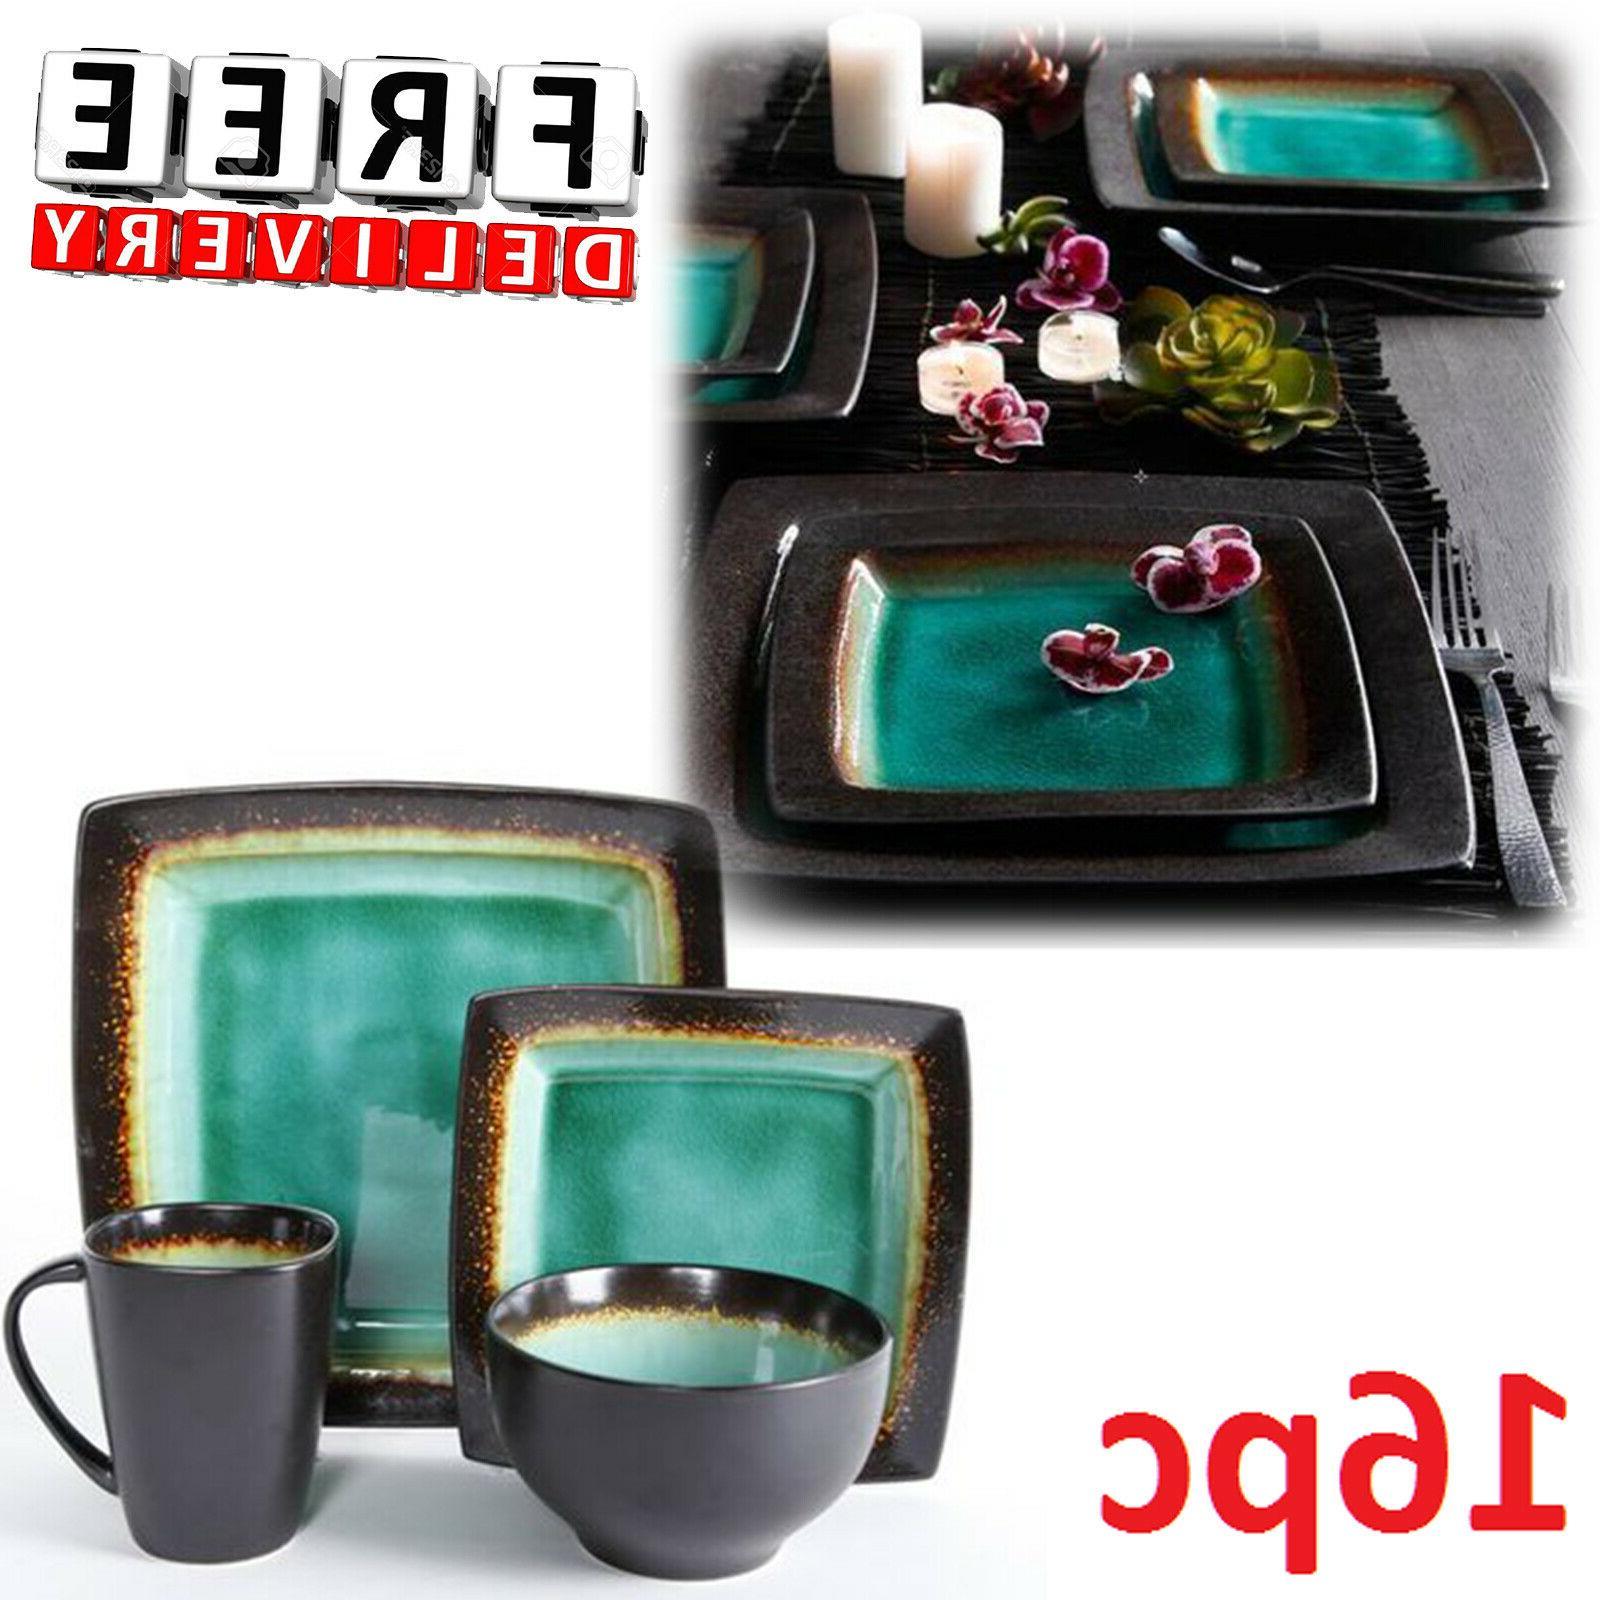 square dinnerware set for 4 16pcs stoneware